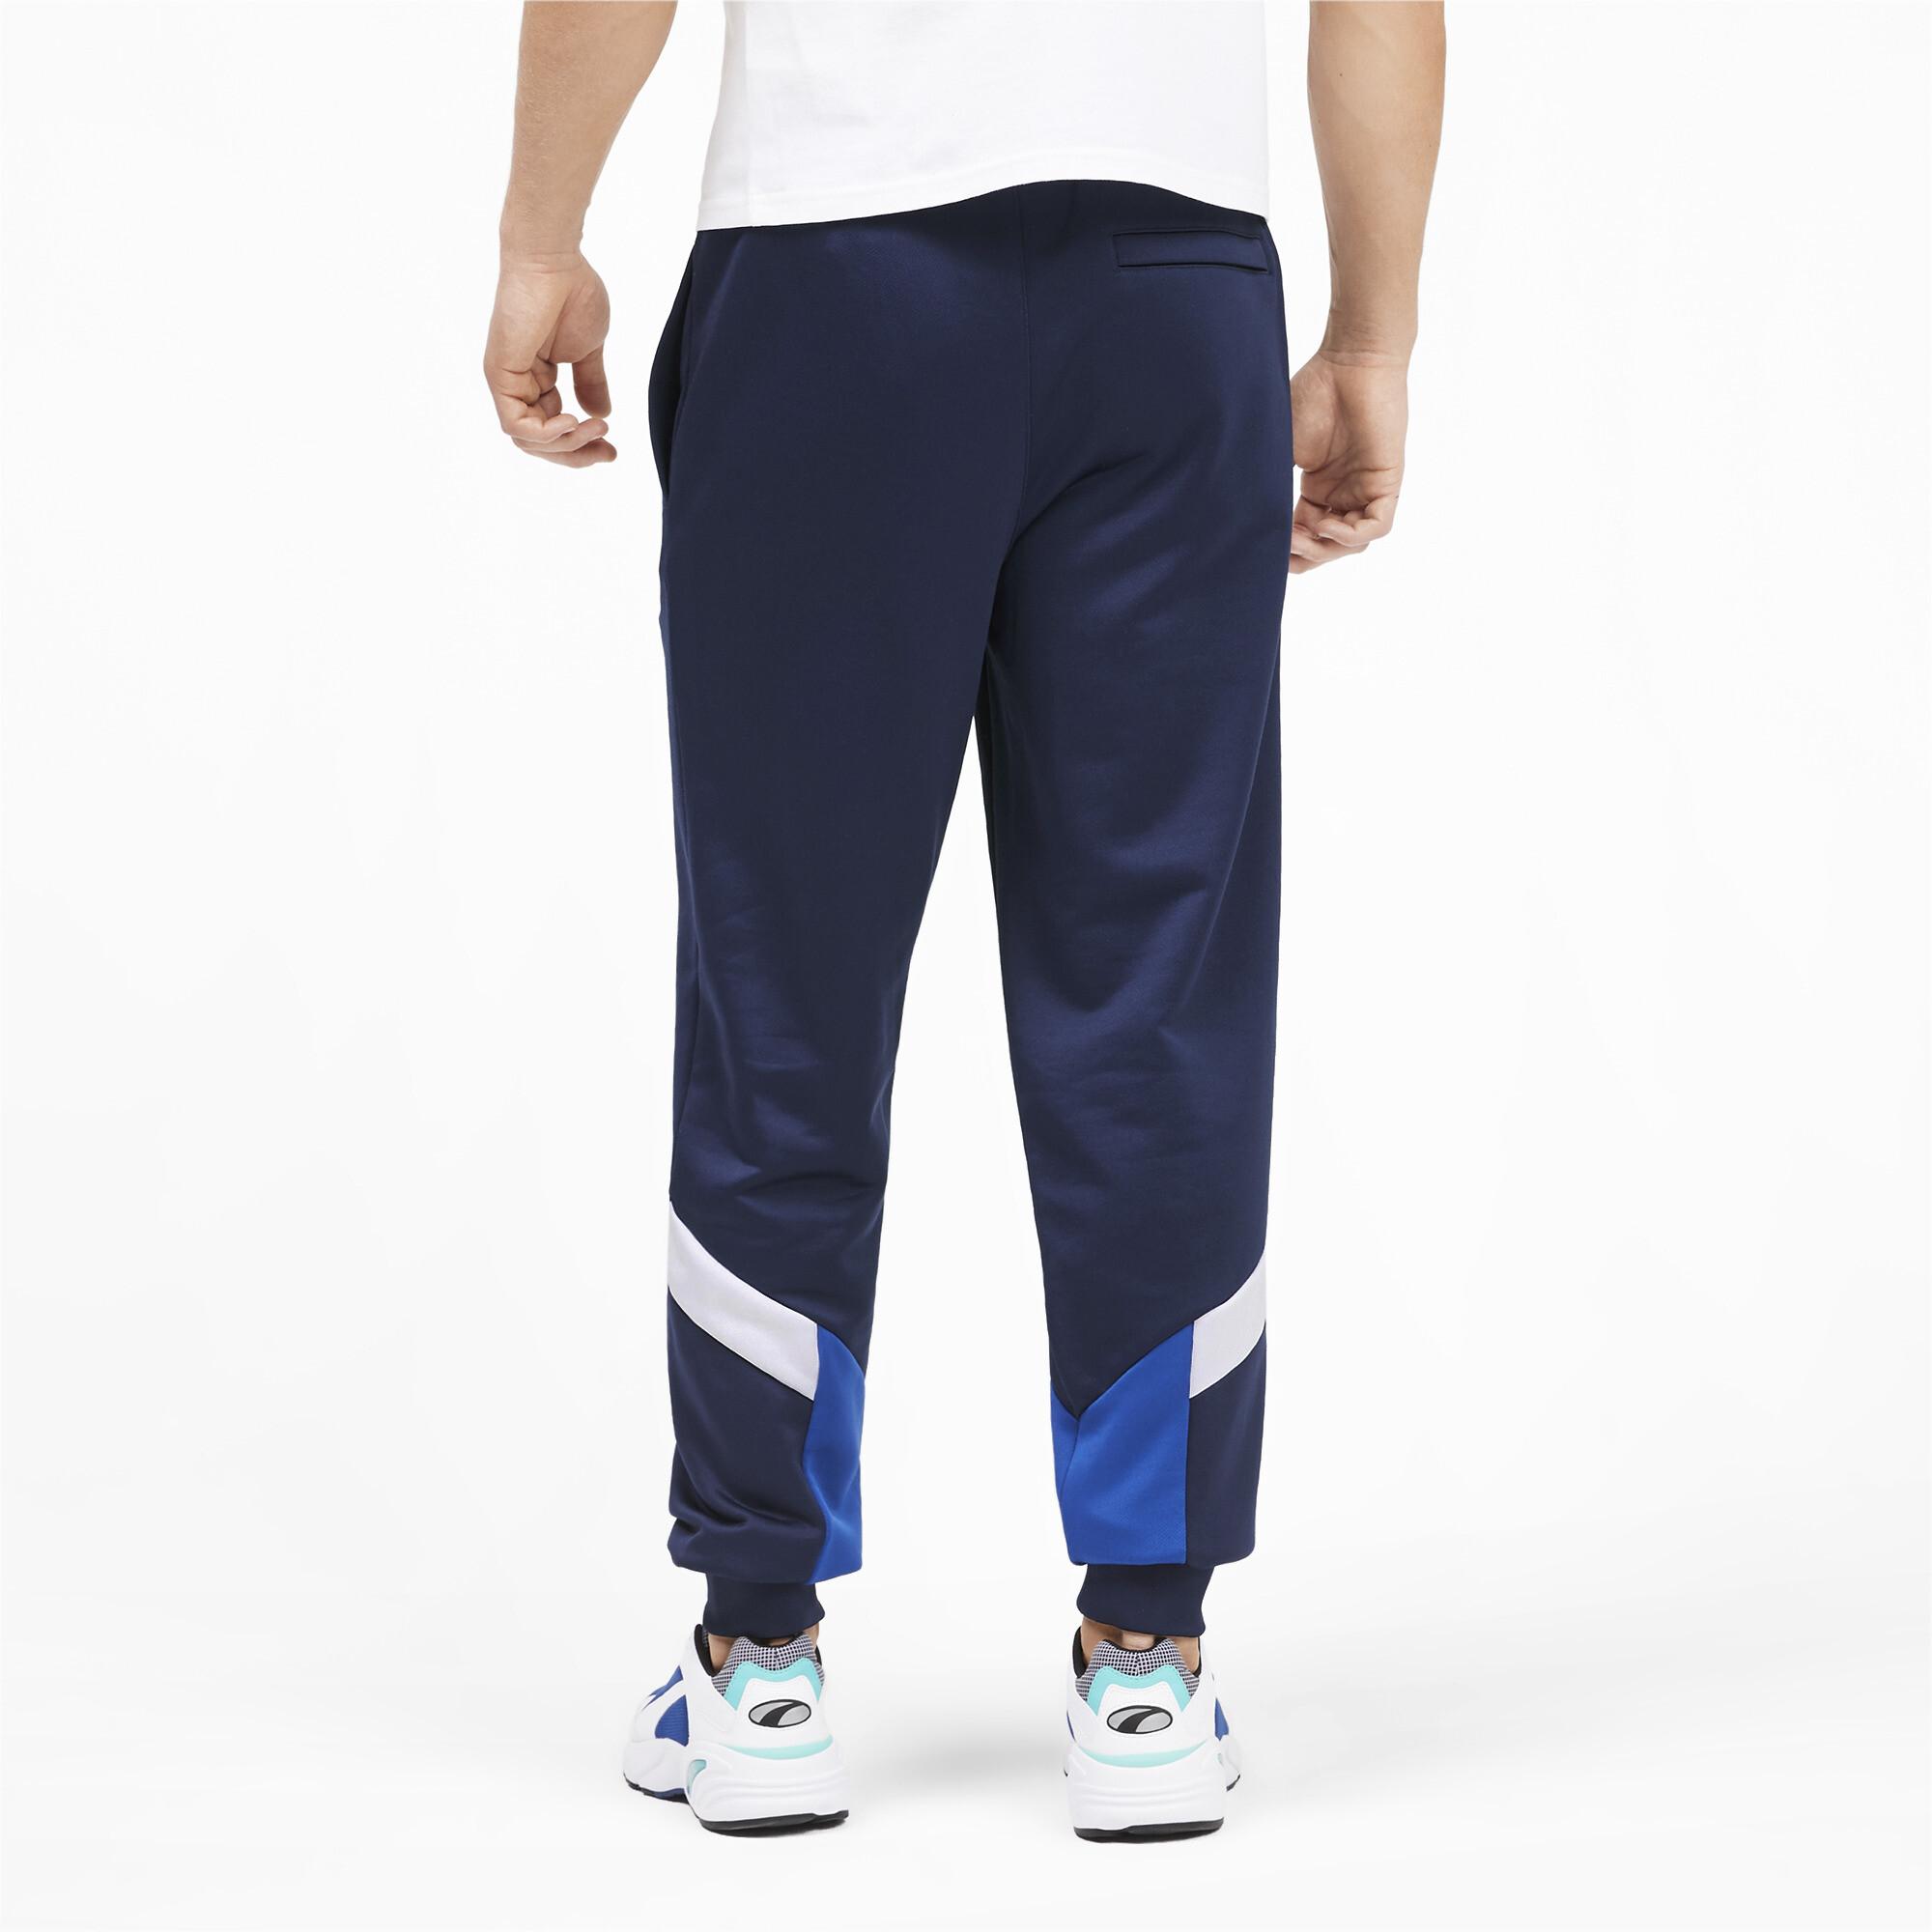 PUMA-Iconic-MCS-Men-039-s-Track-Pants-Men-Knitted-Pants-Sport-Classics thumbnail 21